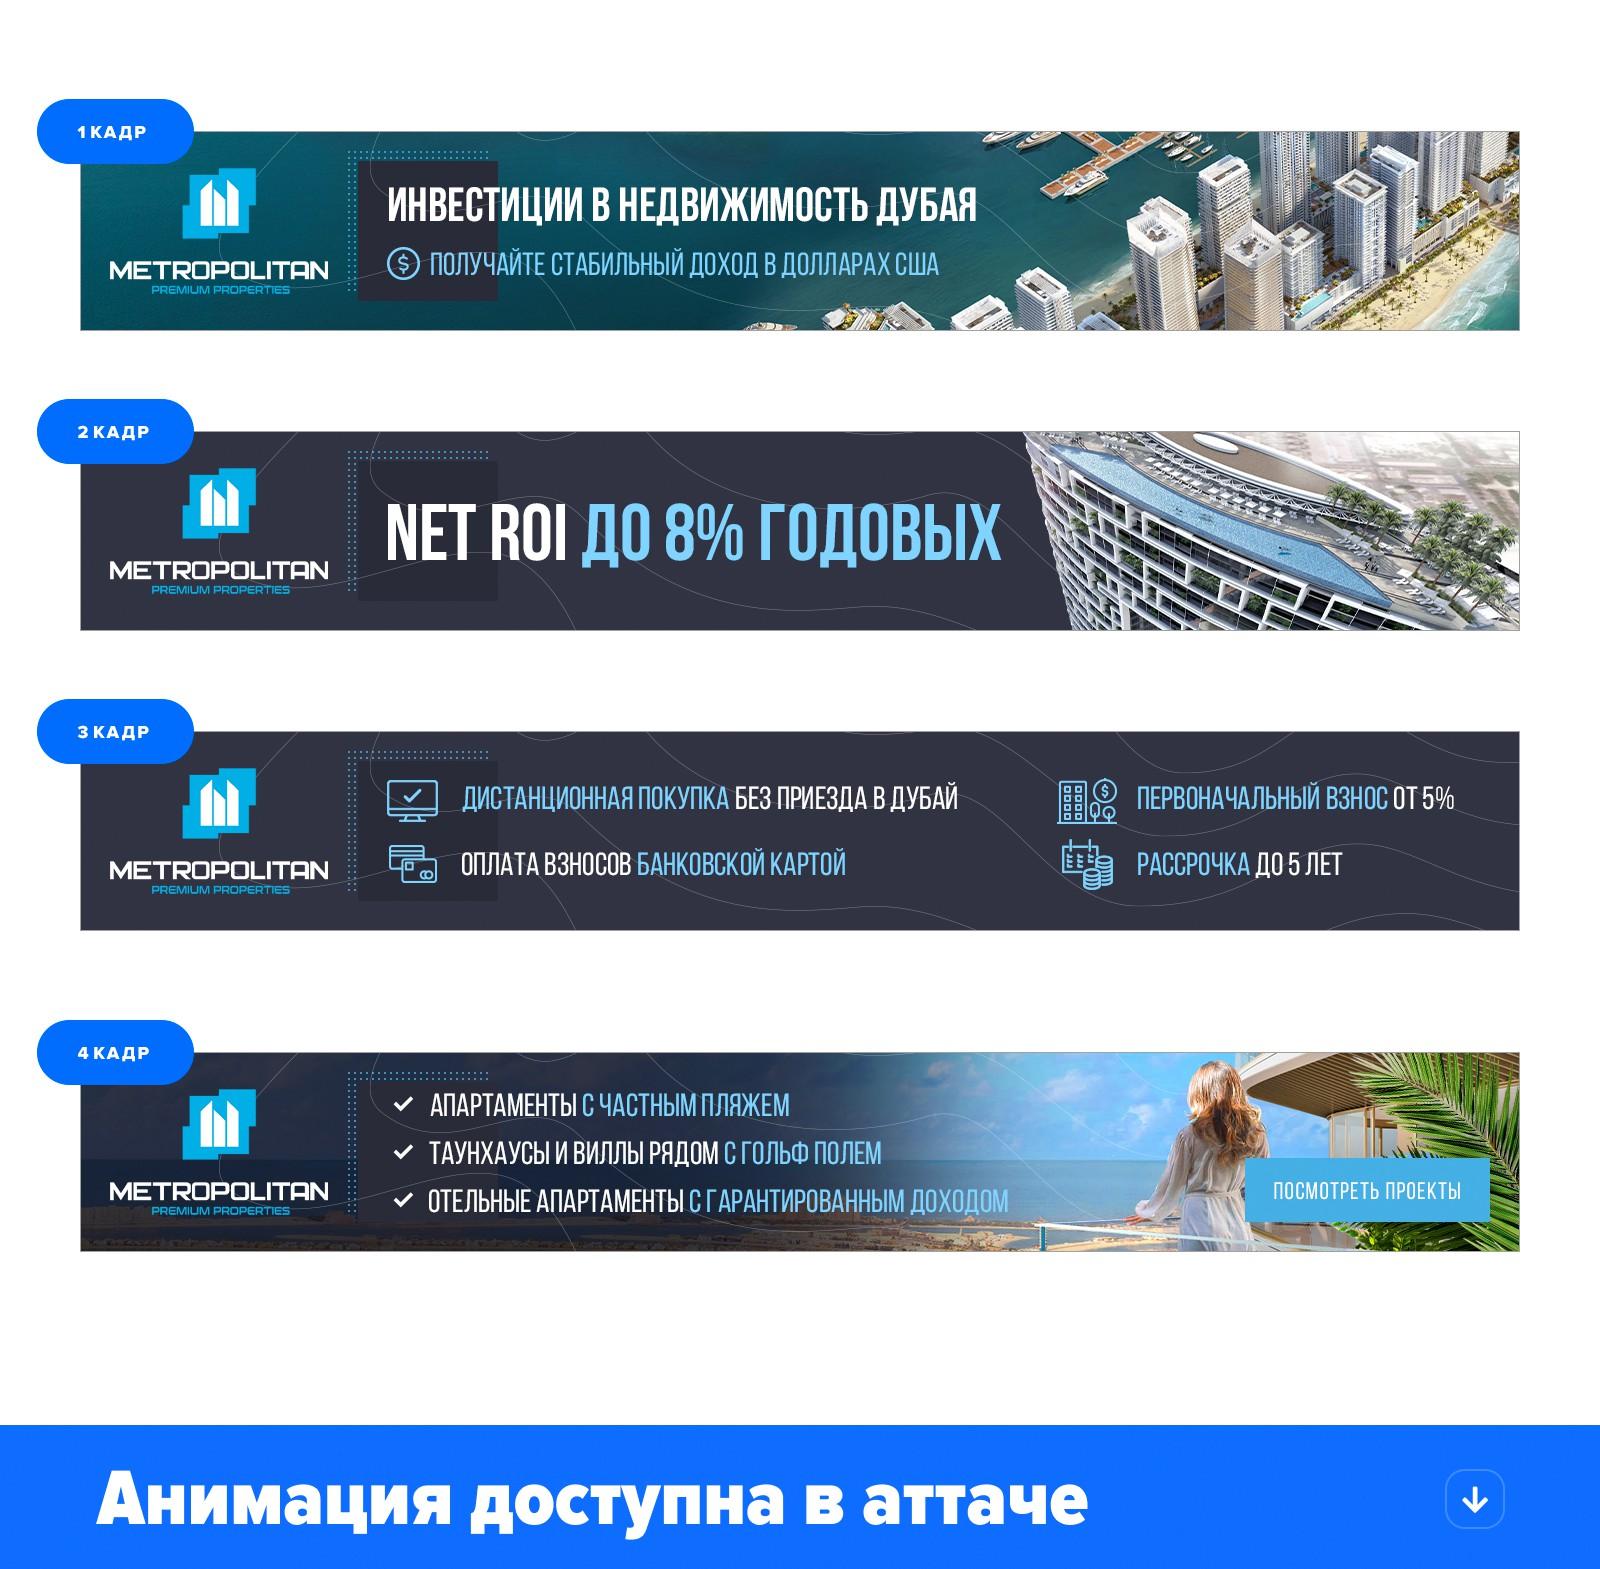 HTML-5 баннер METROPOLITAN